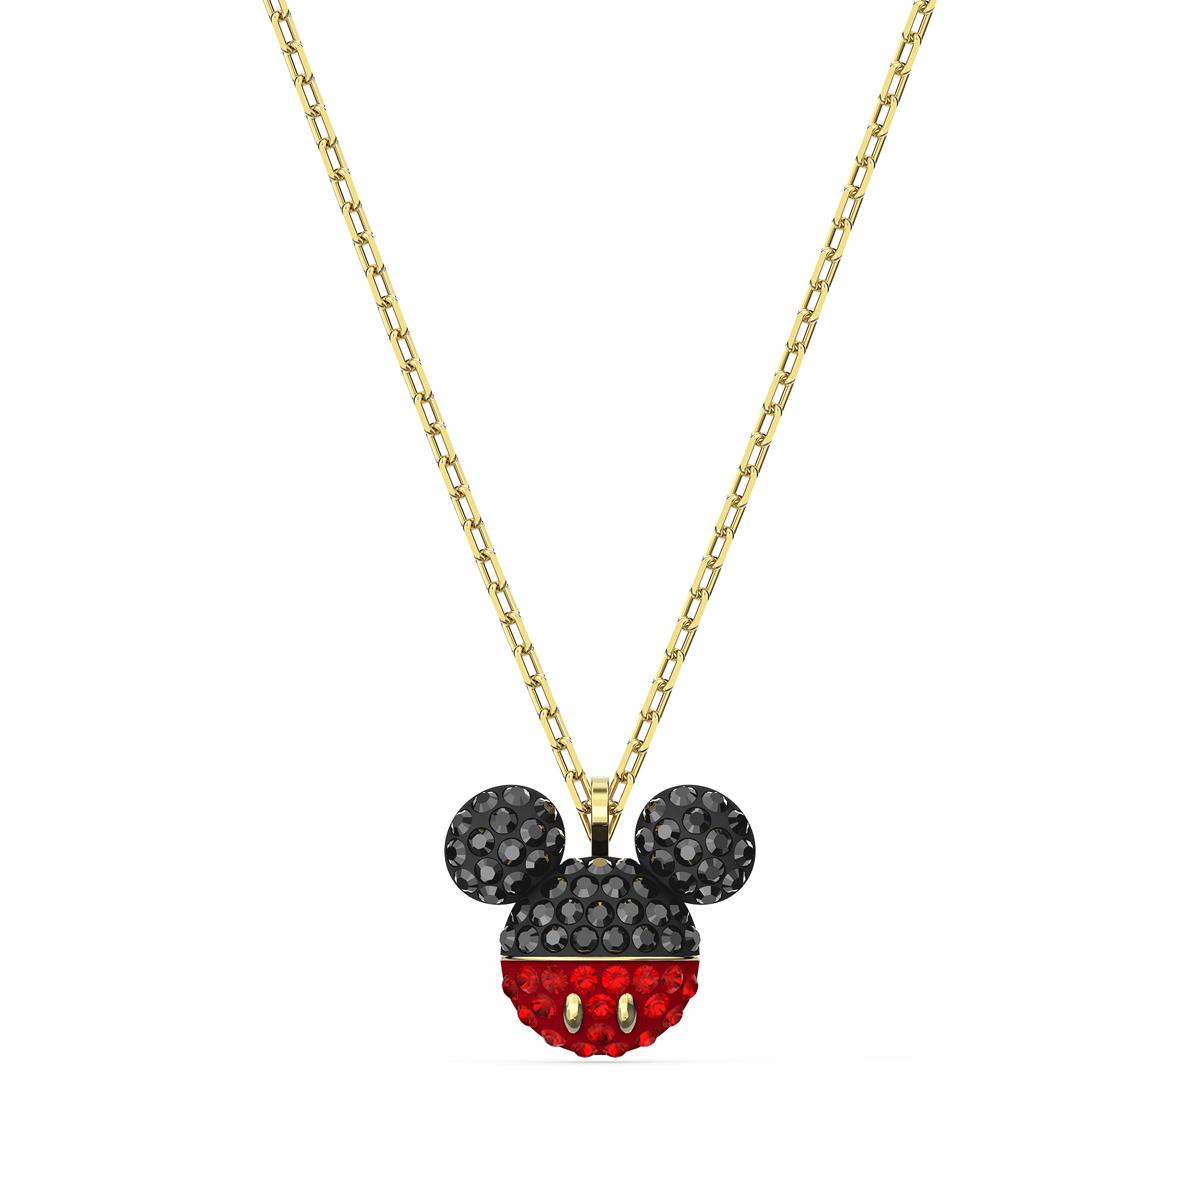 Swarovski Mickey Pendant Necklace, Black, Gold Tone Plated